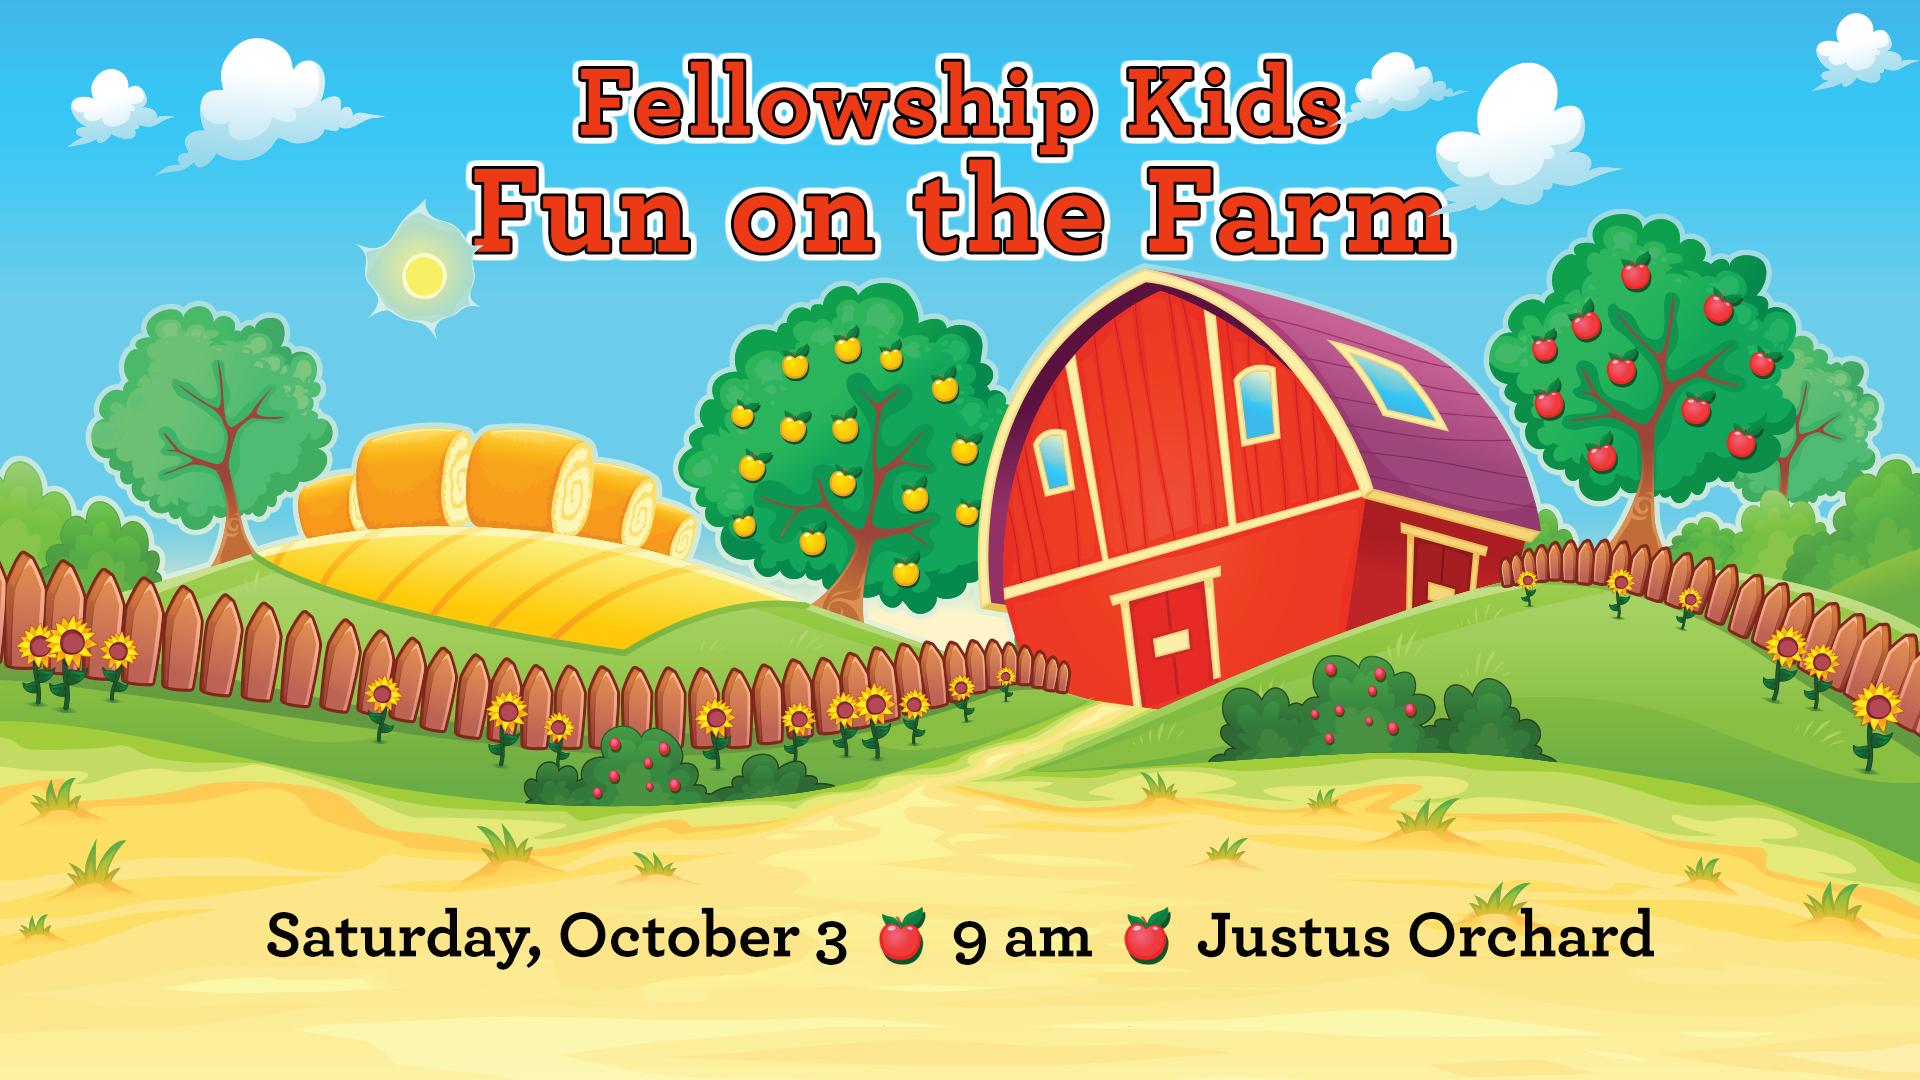 Fun on the Farm FK event